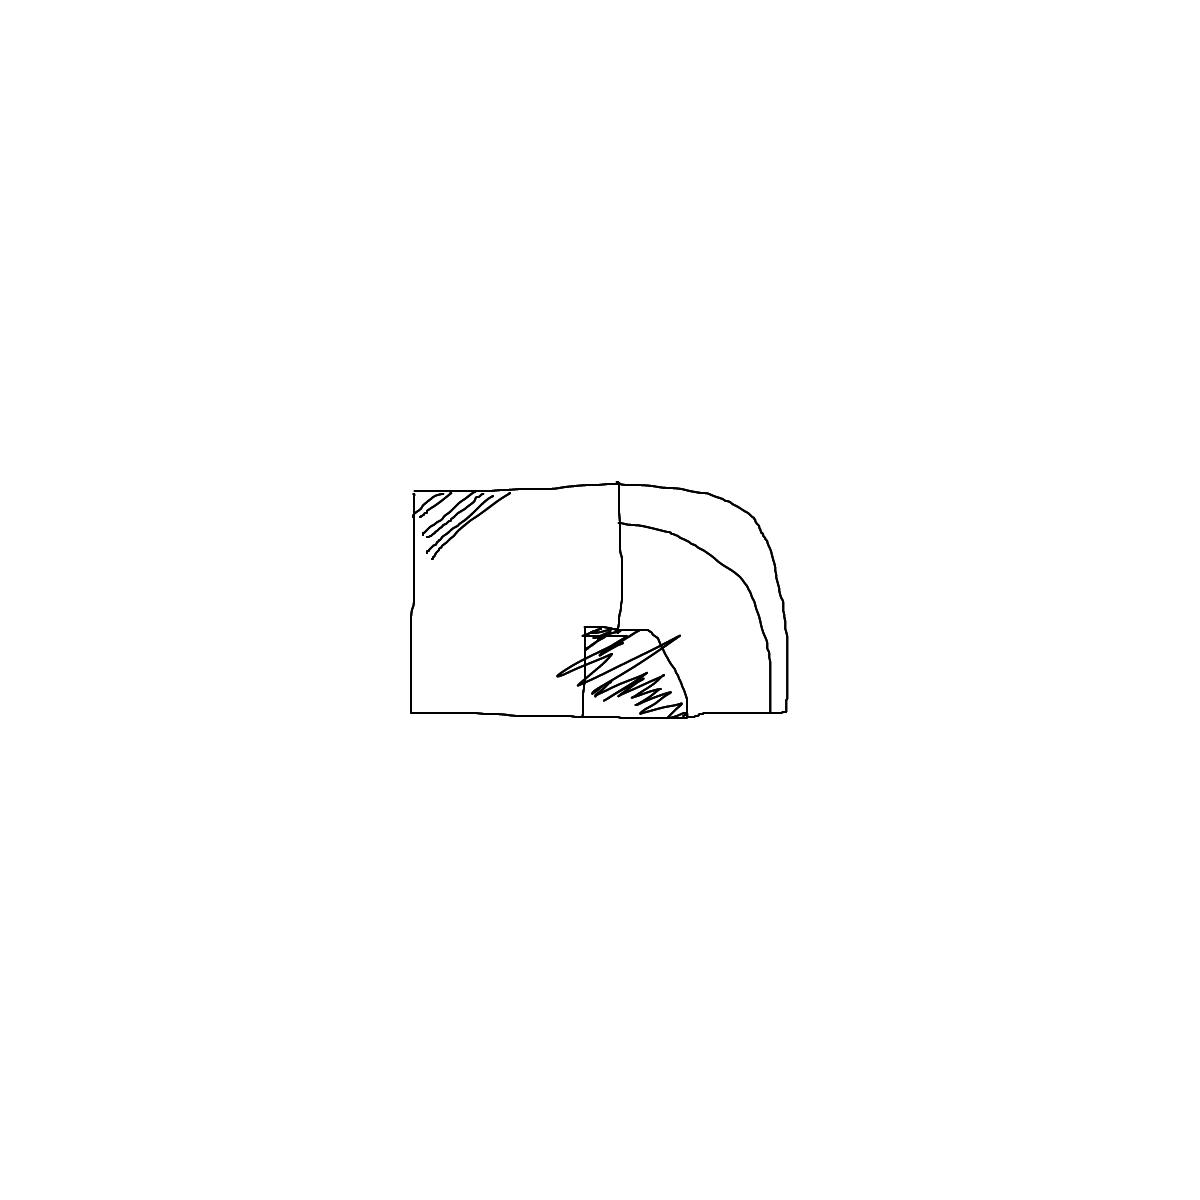 BAAAM drawing#5402 lat:39.2666435241699200lng: -9.1586675643920900